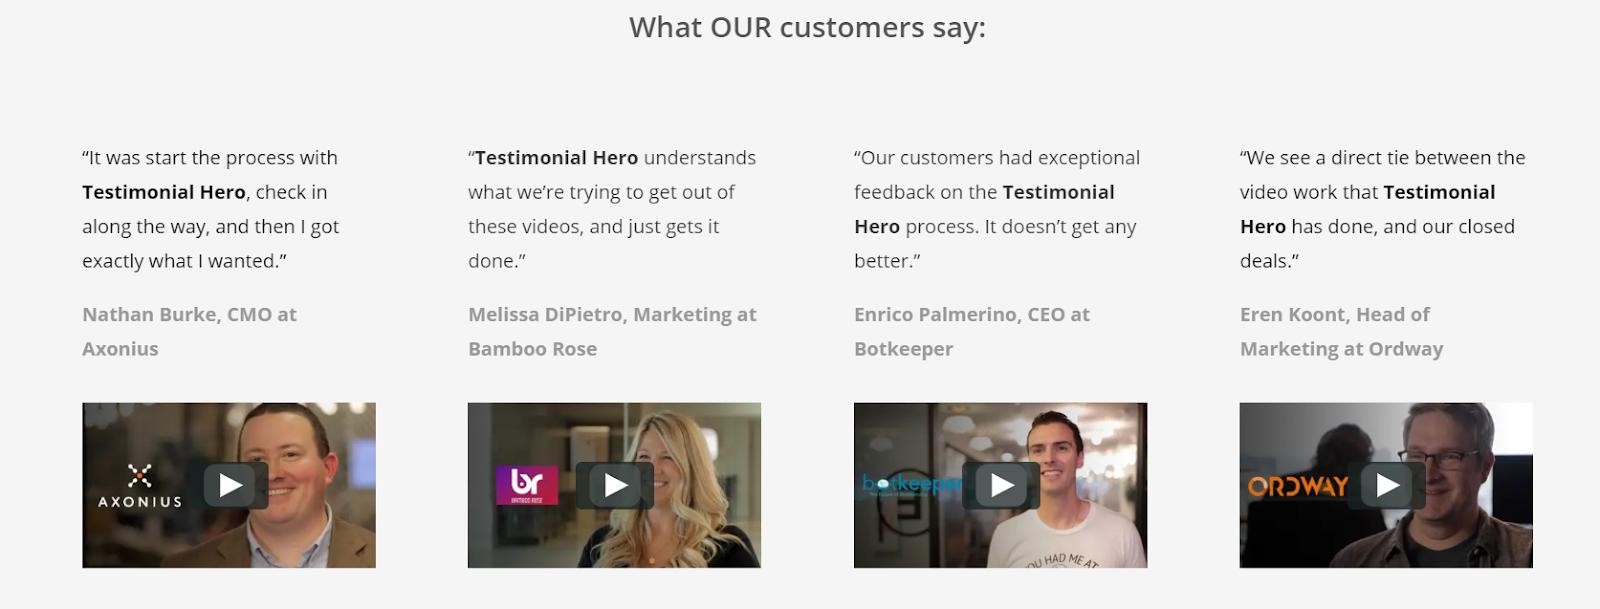 Get more B2B Customer Testimonial Videos